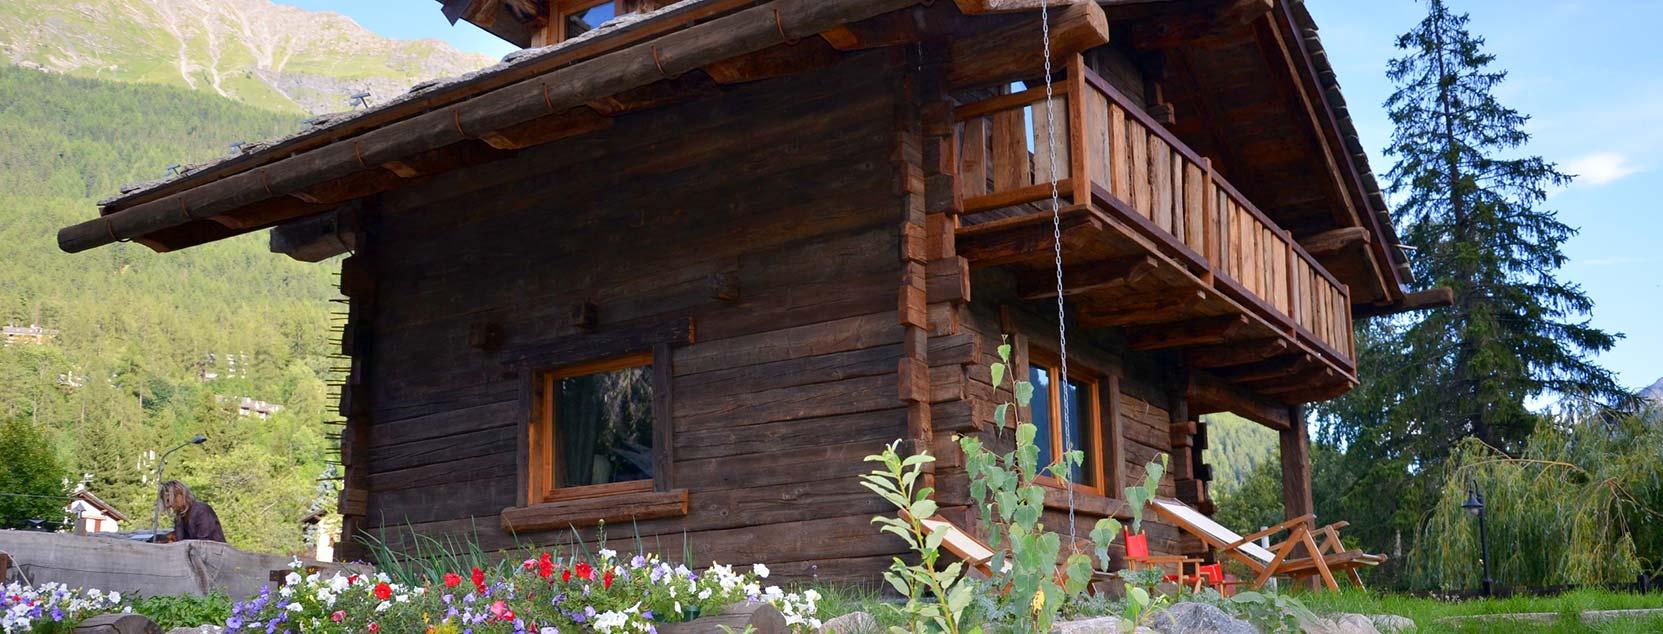 chalet svizzero appartamenti vacanze courmayeur hotel